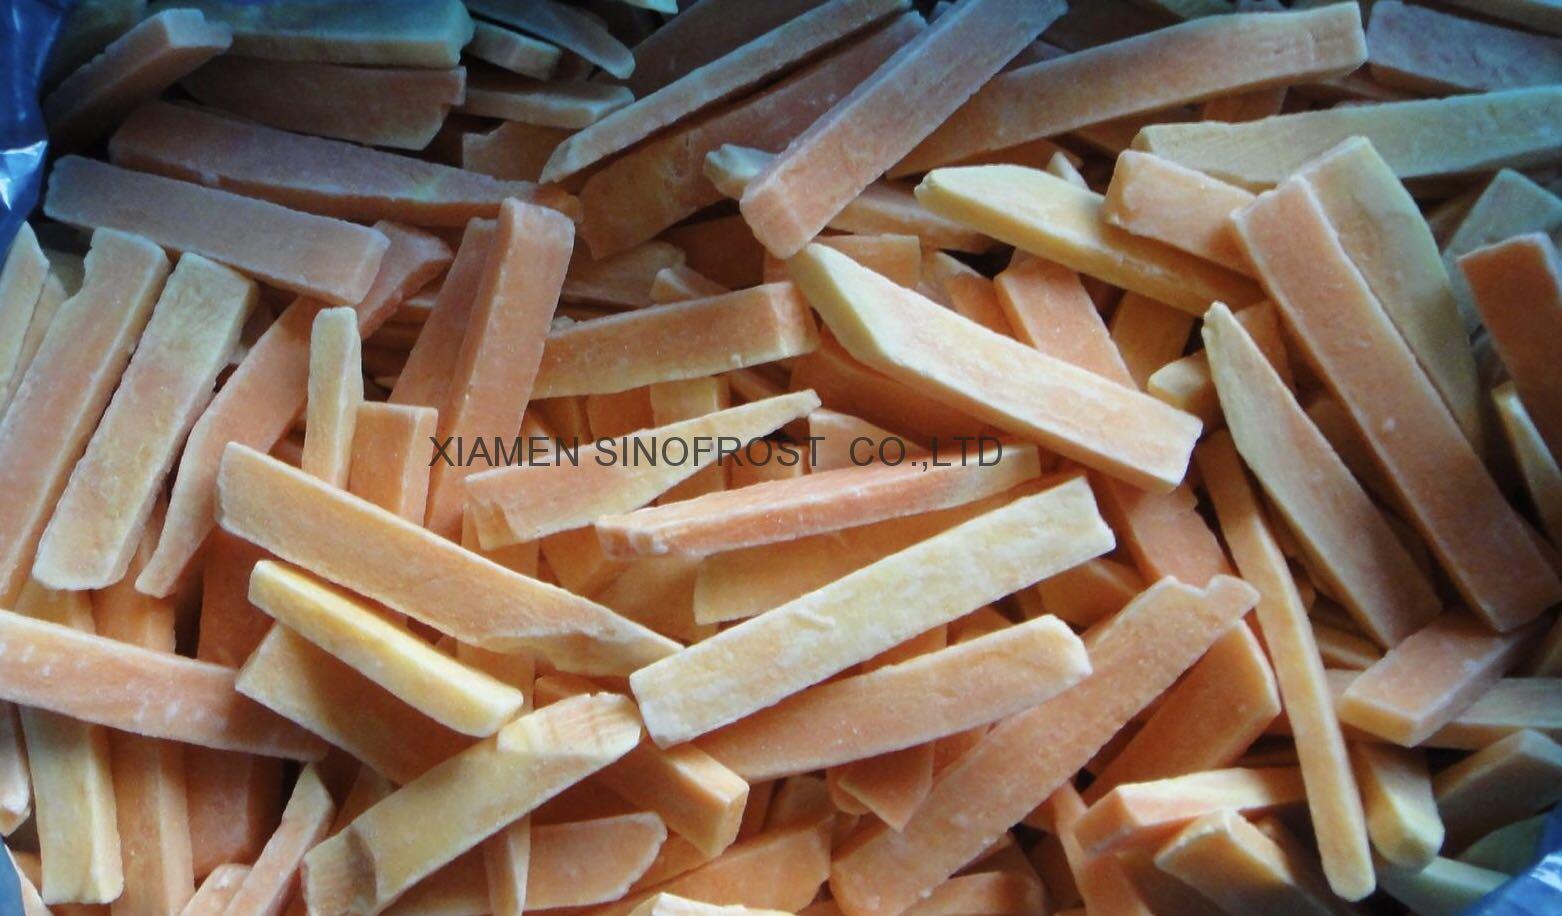 IQF Sweet Potato Dices,Frozen Sweet Potato Dices,IQF Cut Sweet Potato 12